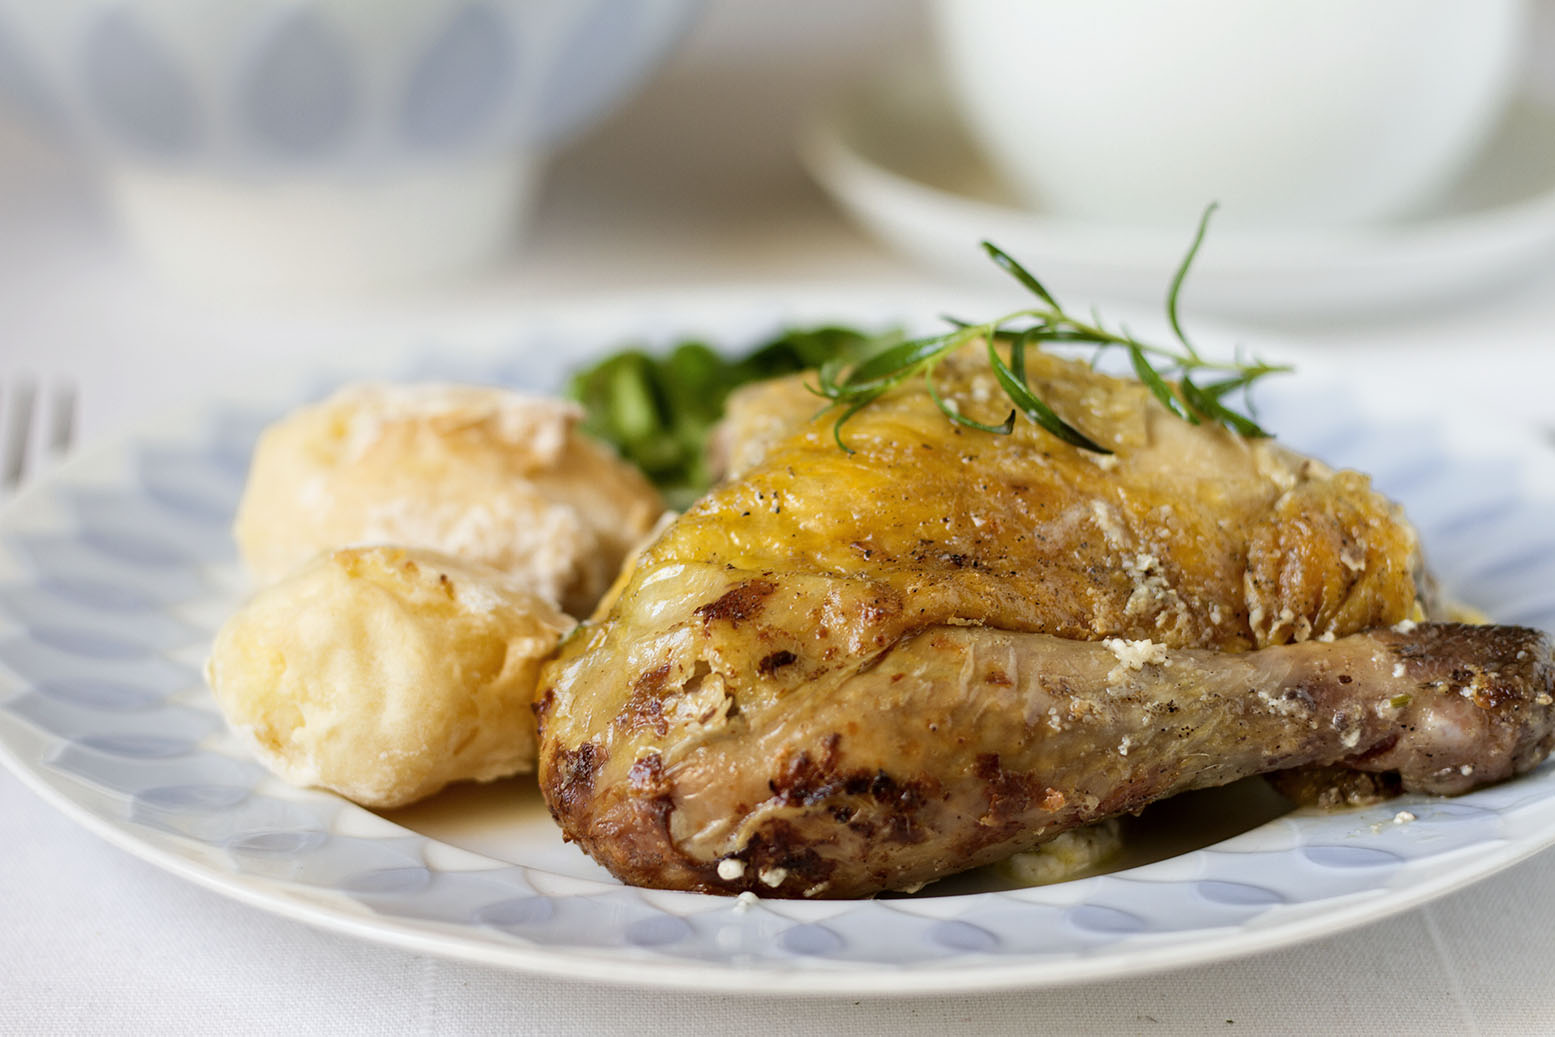 Wielkanoc Kuchnia W Formie Part 3